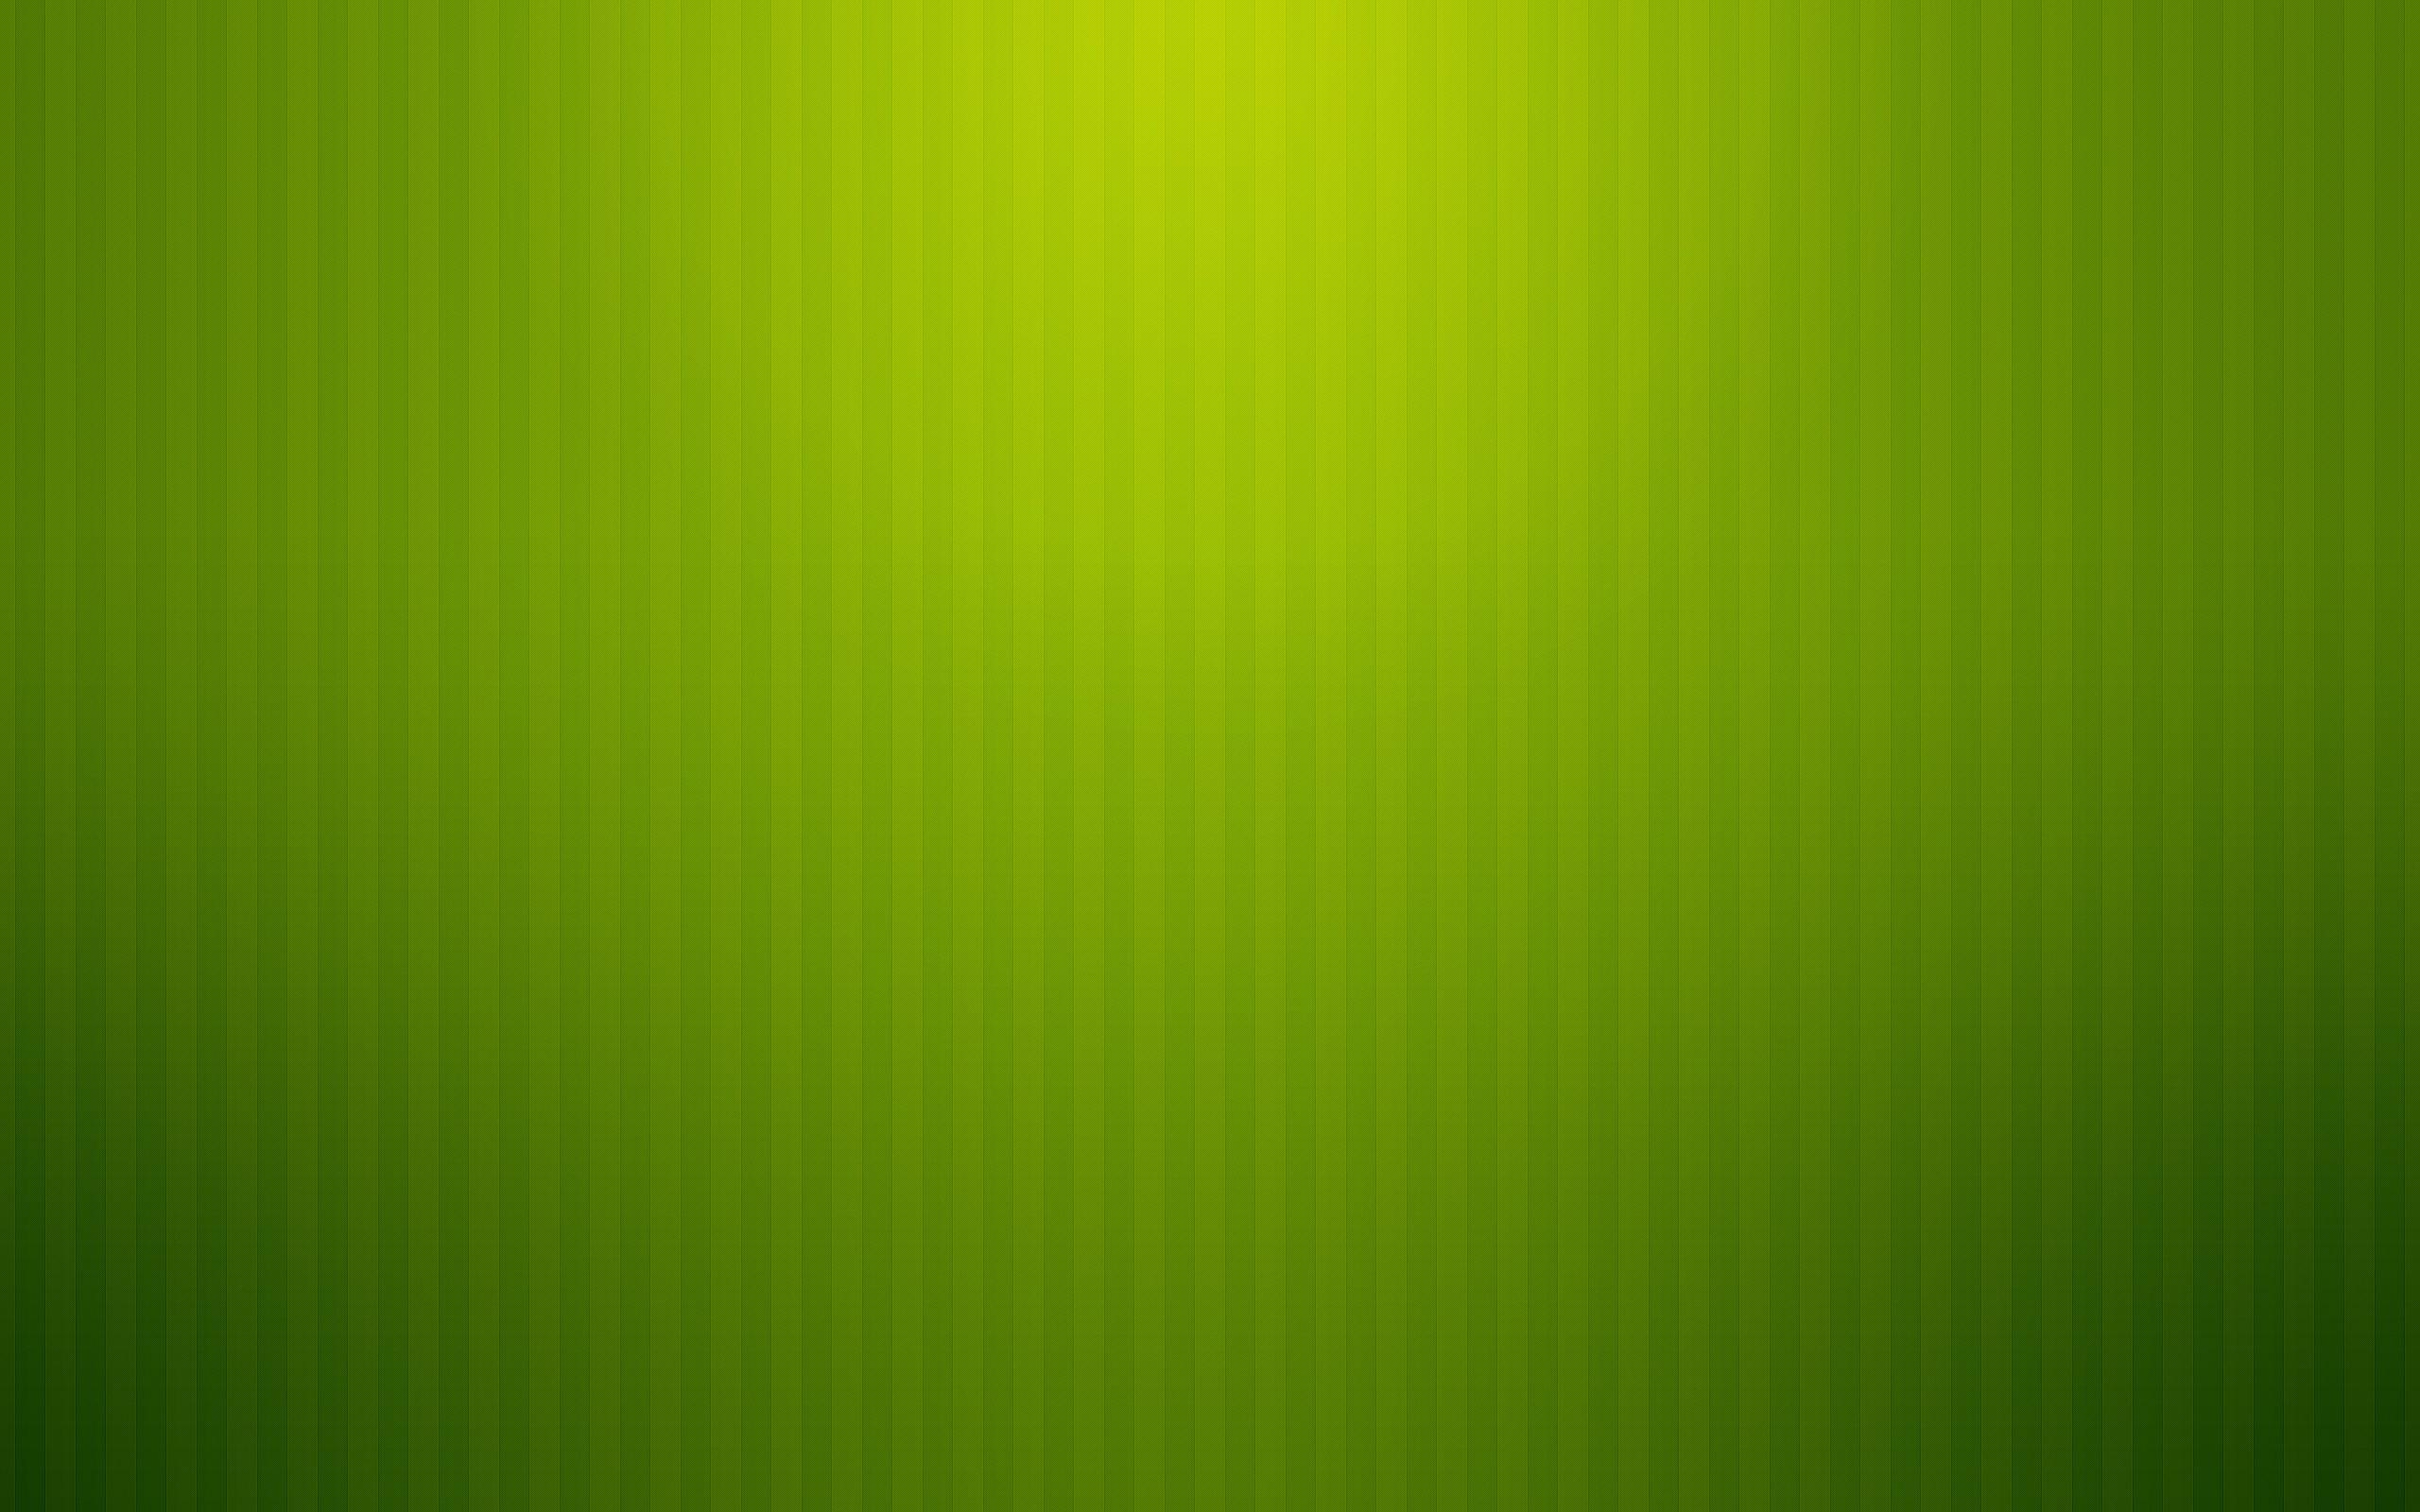 Pin On Green